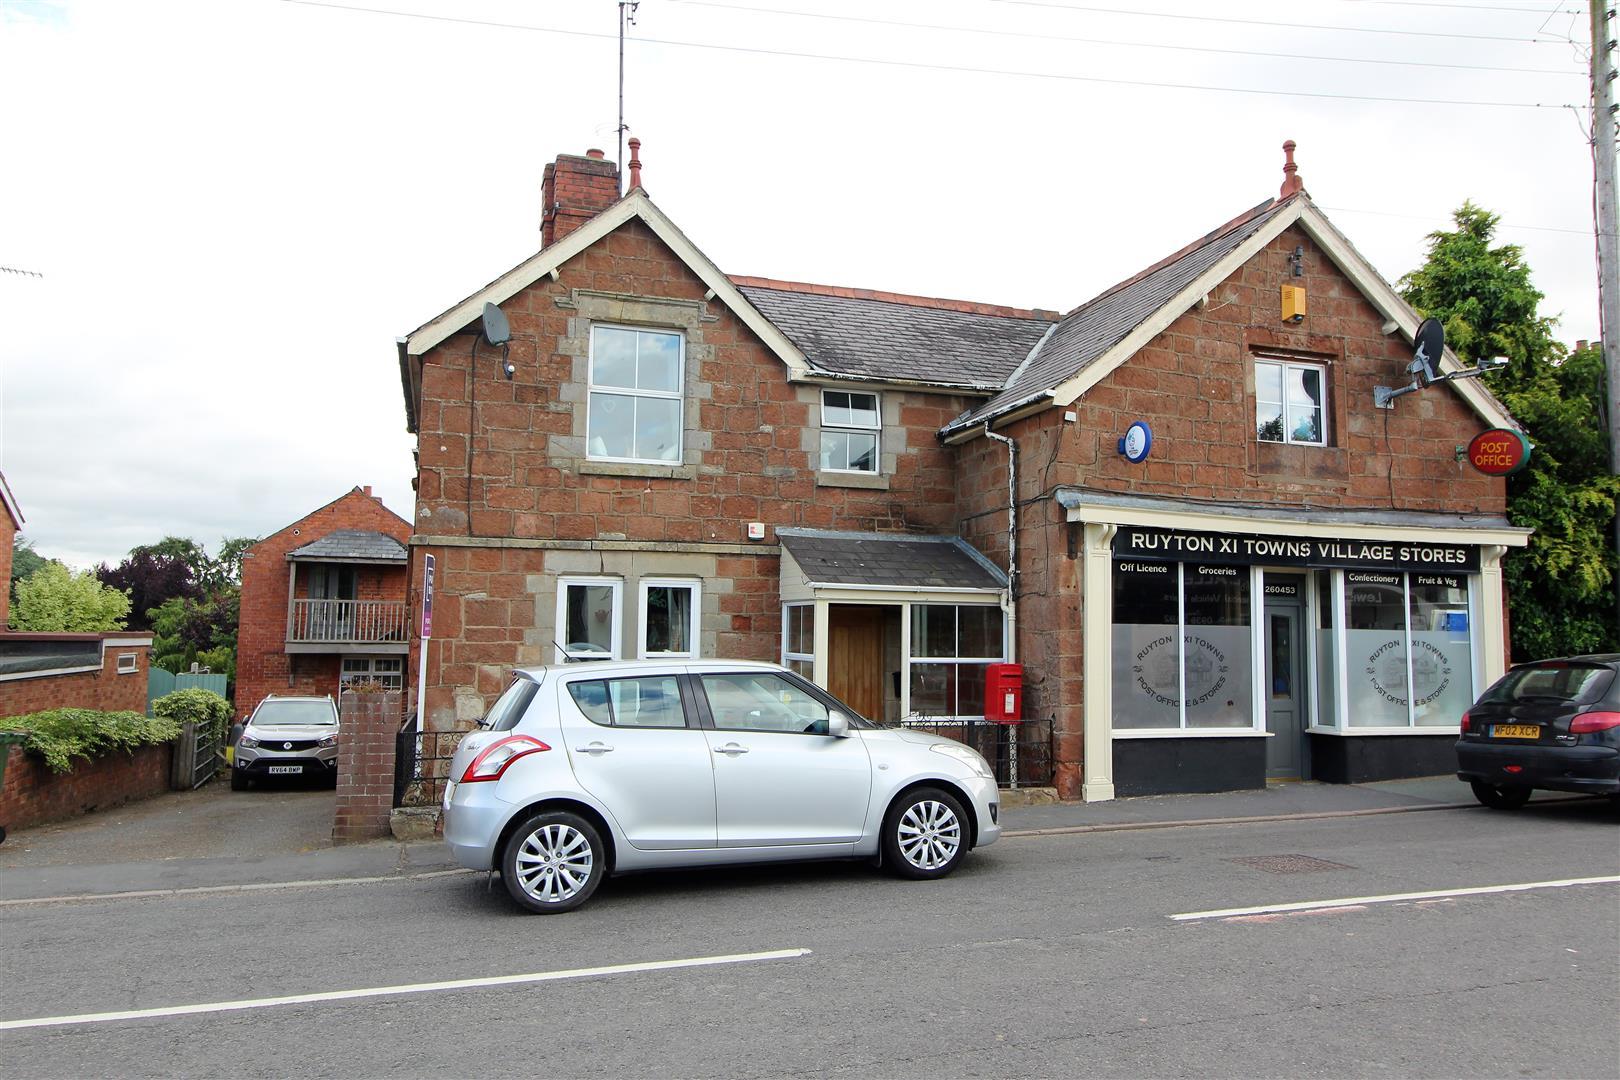 Church Street, Ruyton Xi Towns, Shrewsbury